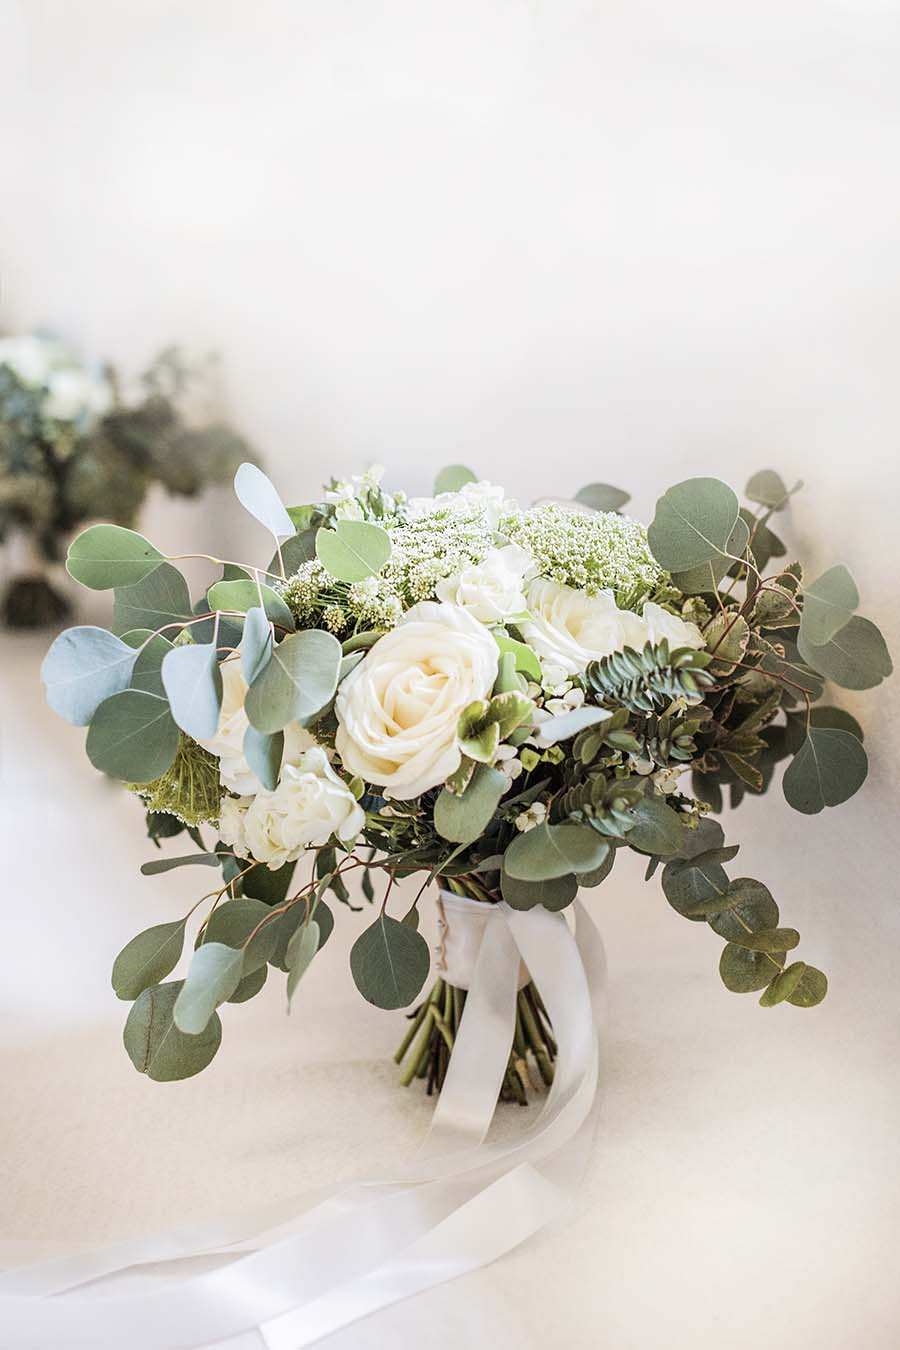 Hiden Floral Design | Wedding Flowers In Oakham Leicestershire